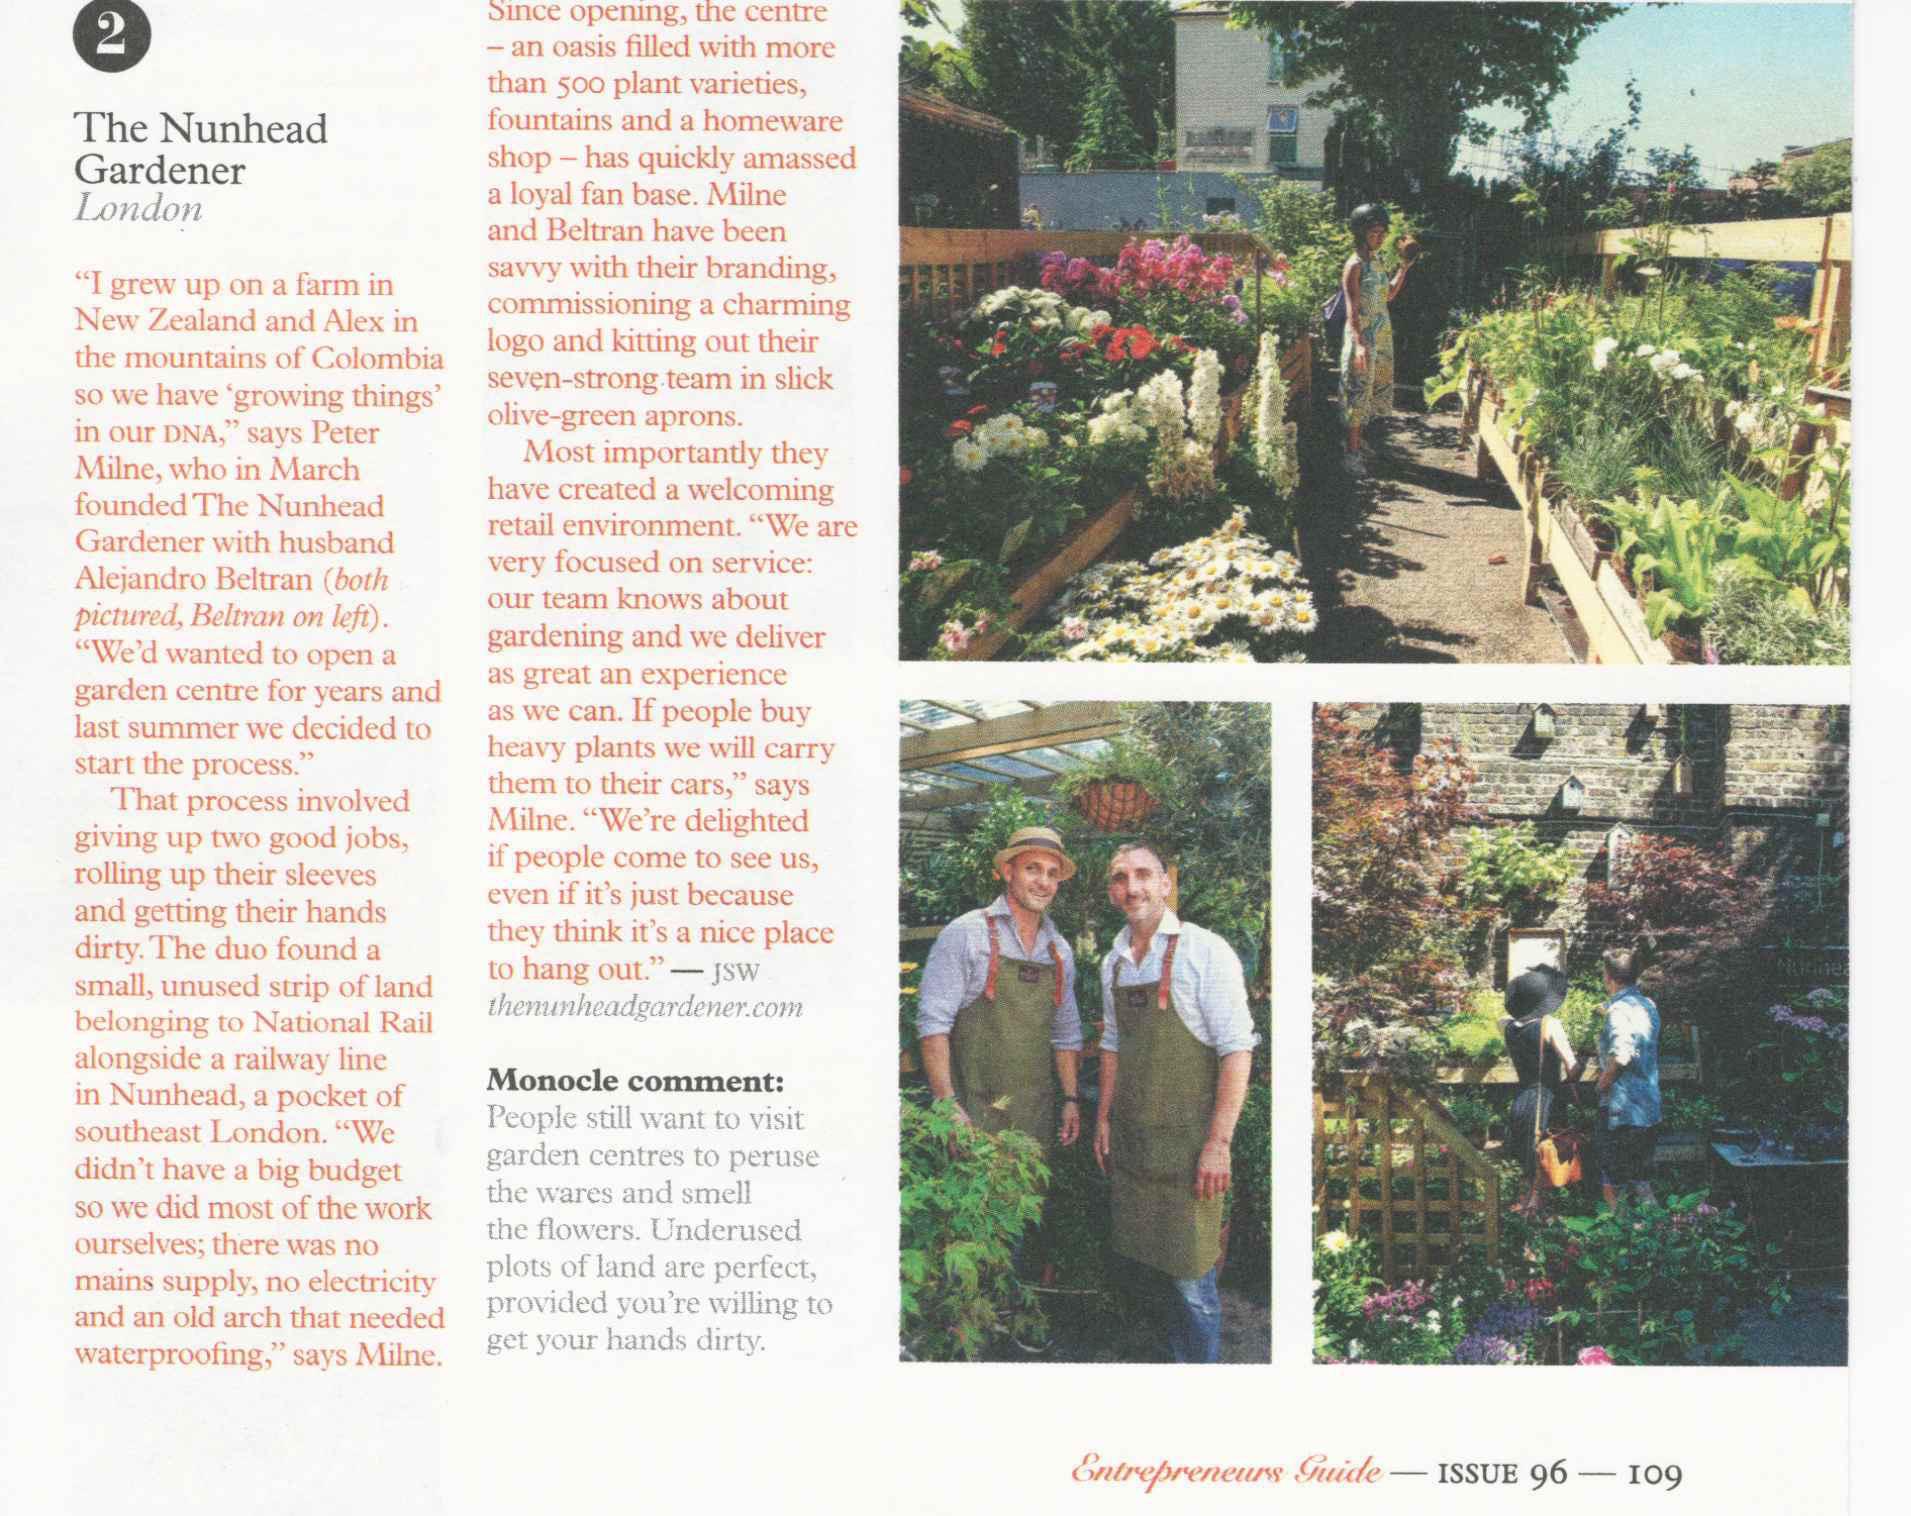 The Nunhead Gardener - Monacle Magazine